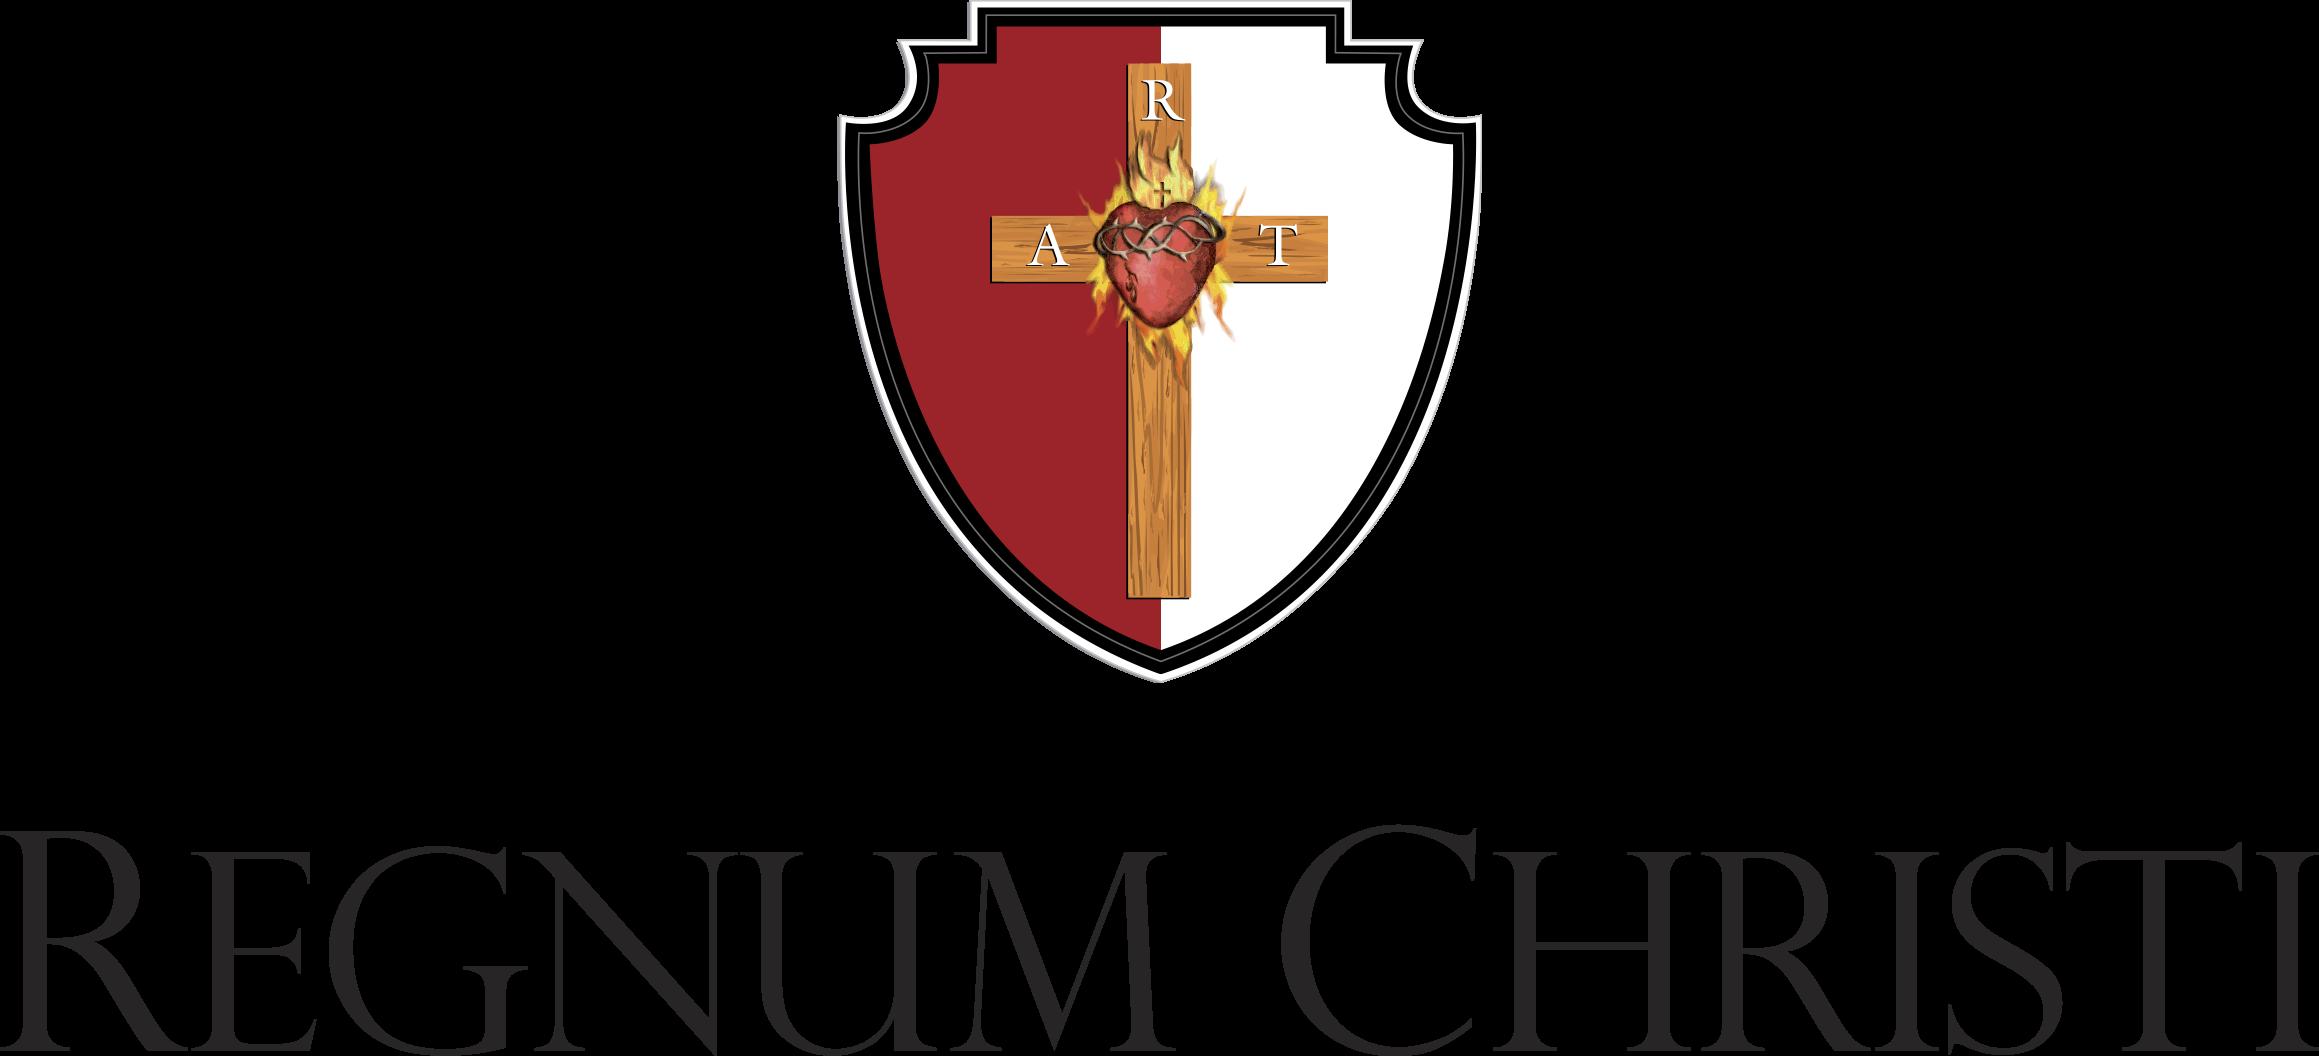 Regnum Christi Chile